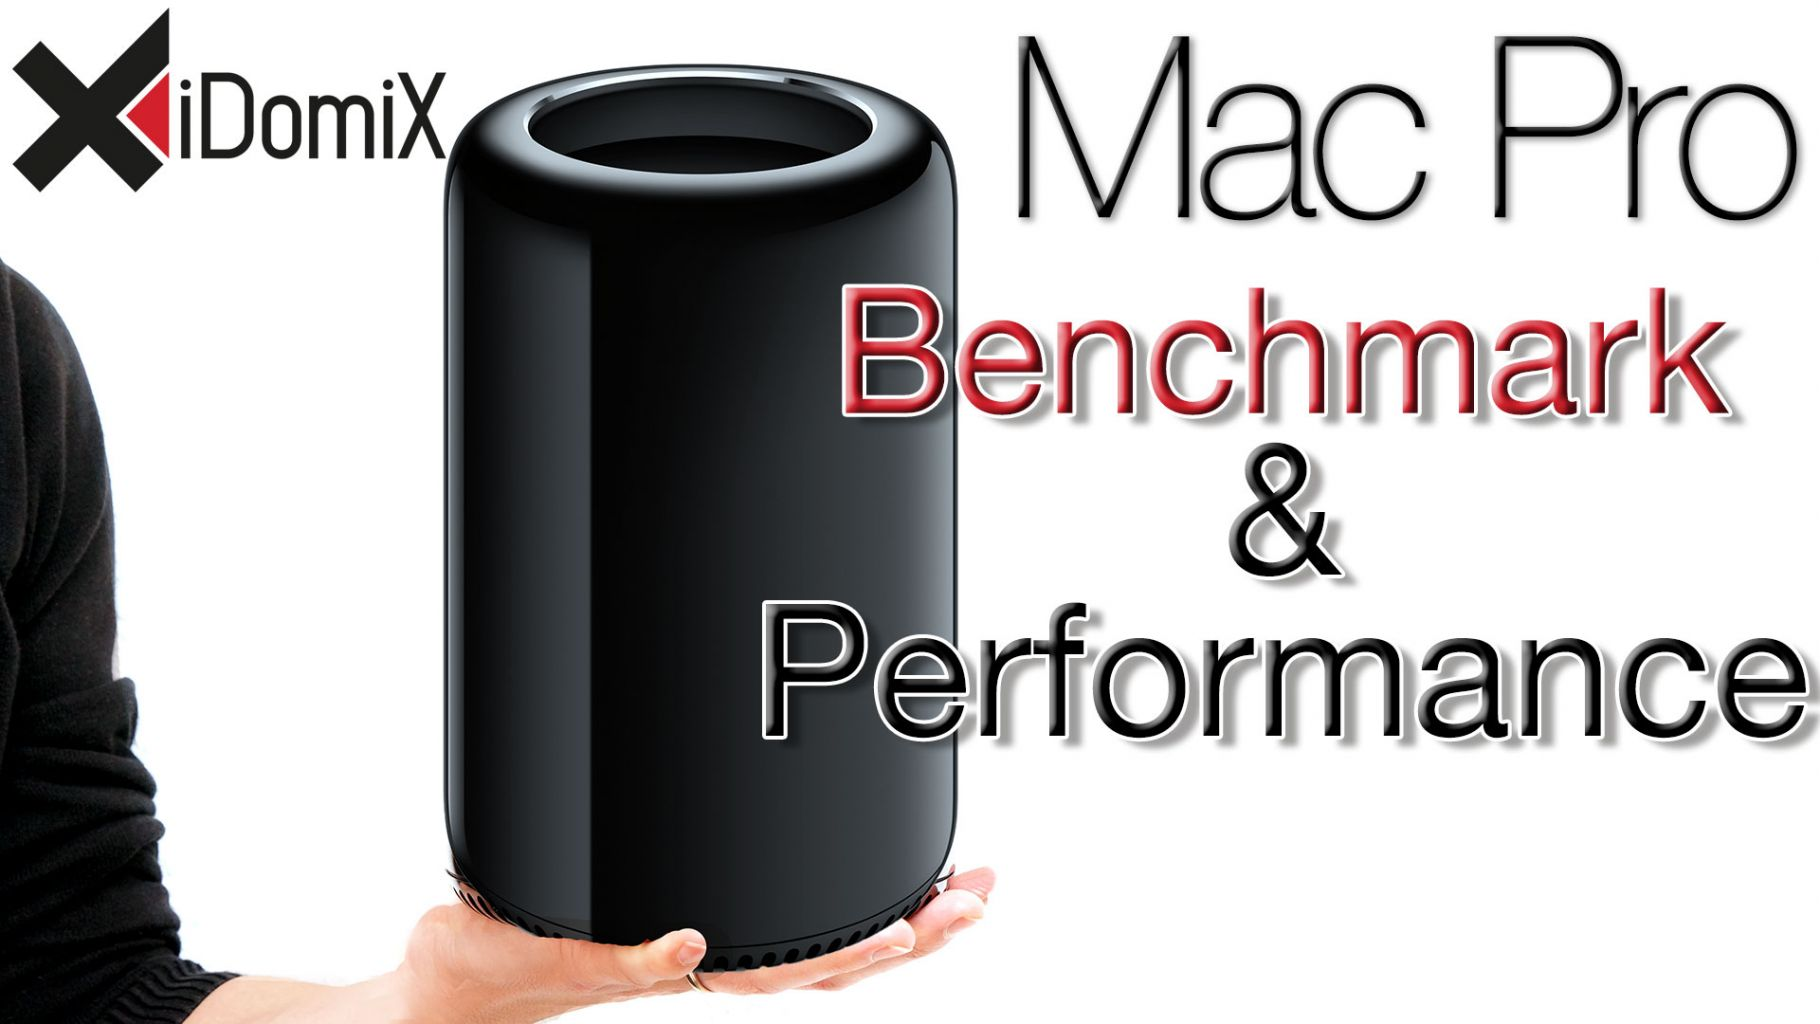 296-mac-pro-benchmark